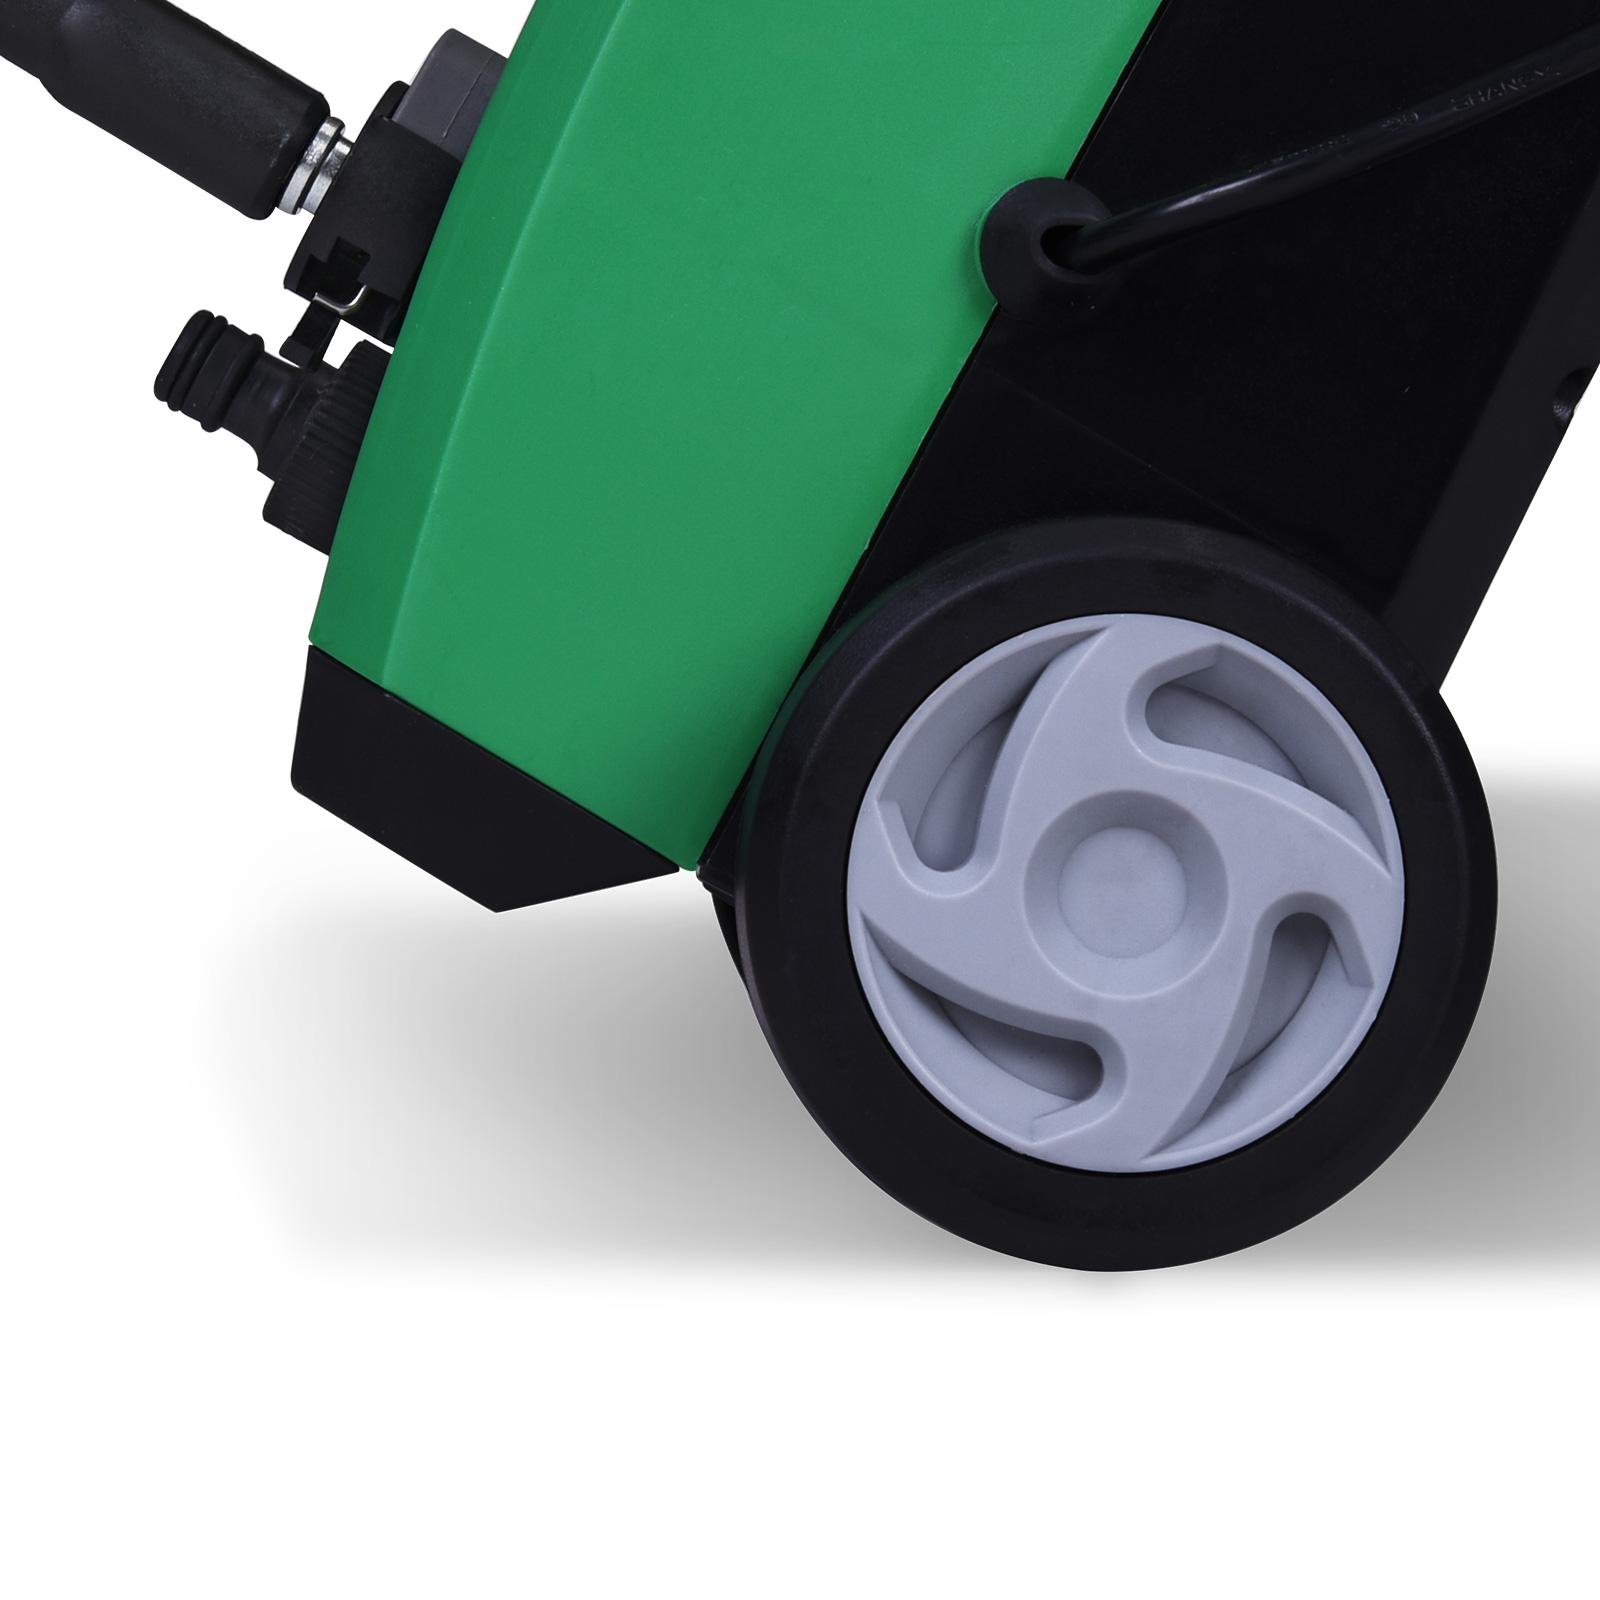 nettoyeur haute pression compact avec ses accessoires 1500 watt 105 bar ebay. Black Bedroom Furniture Sets. Home Design Ideas